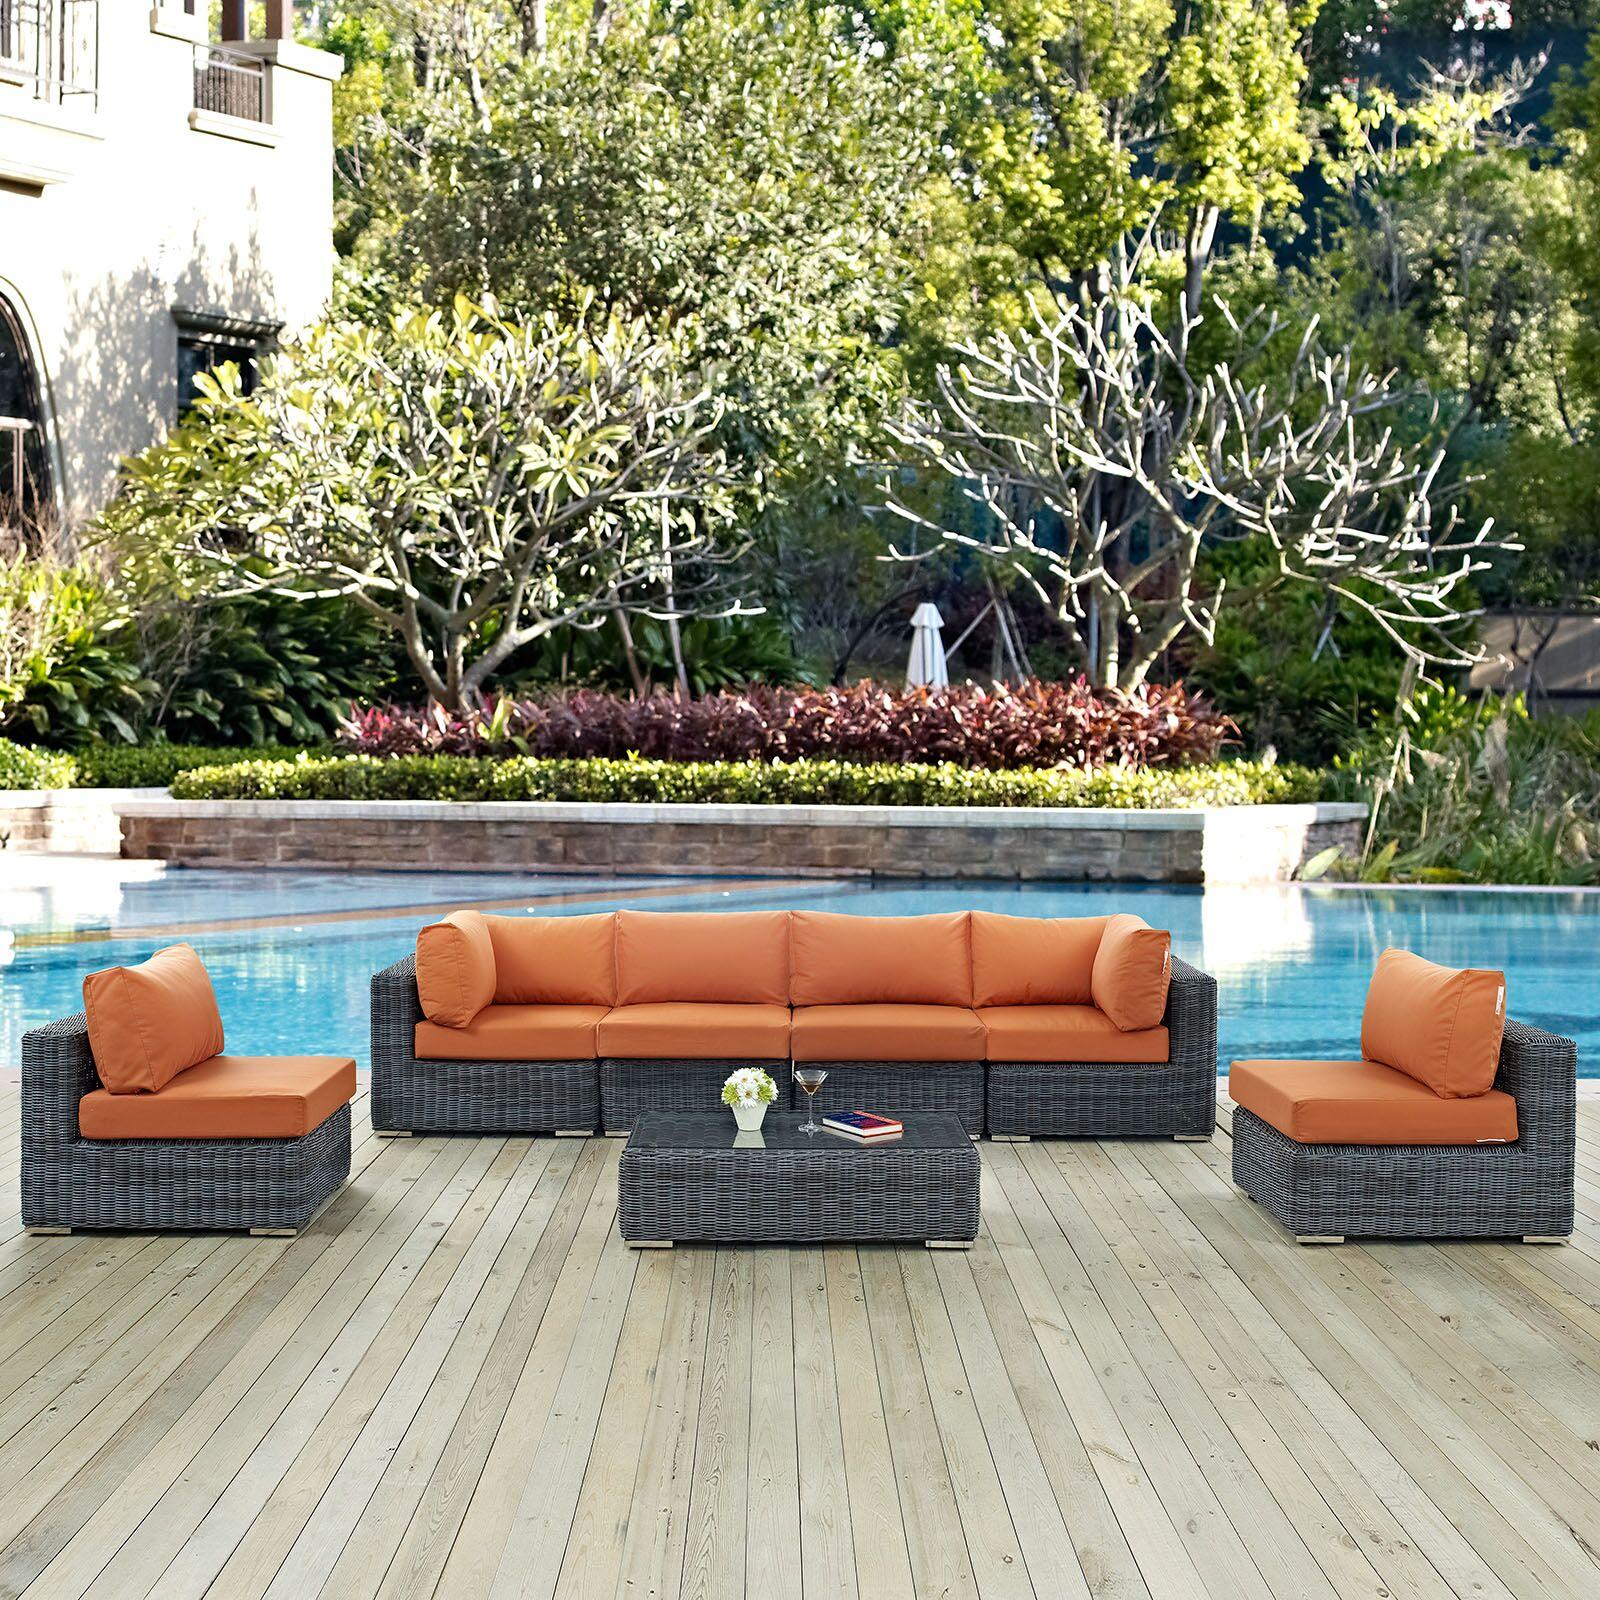 Keiran 7 Piece Sunbrella Sectional Set with Cushions Fabric: Tuscan